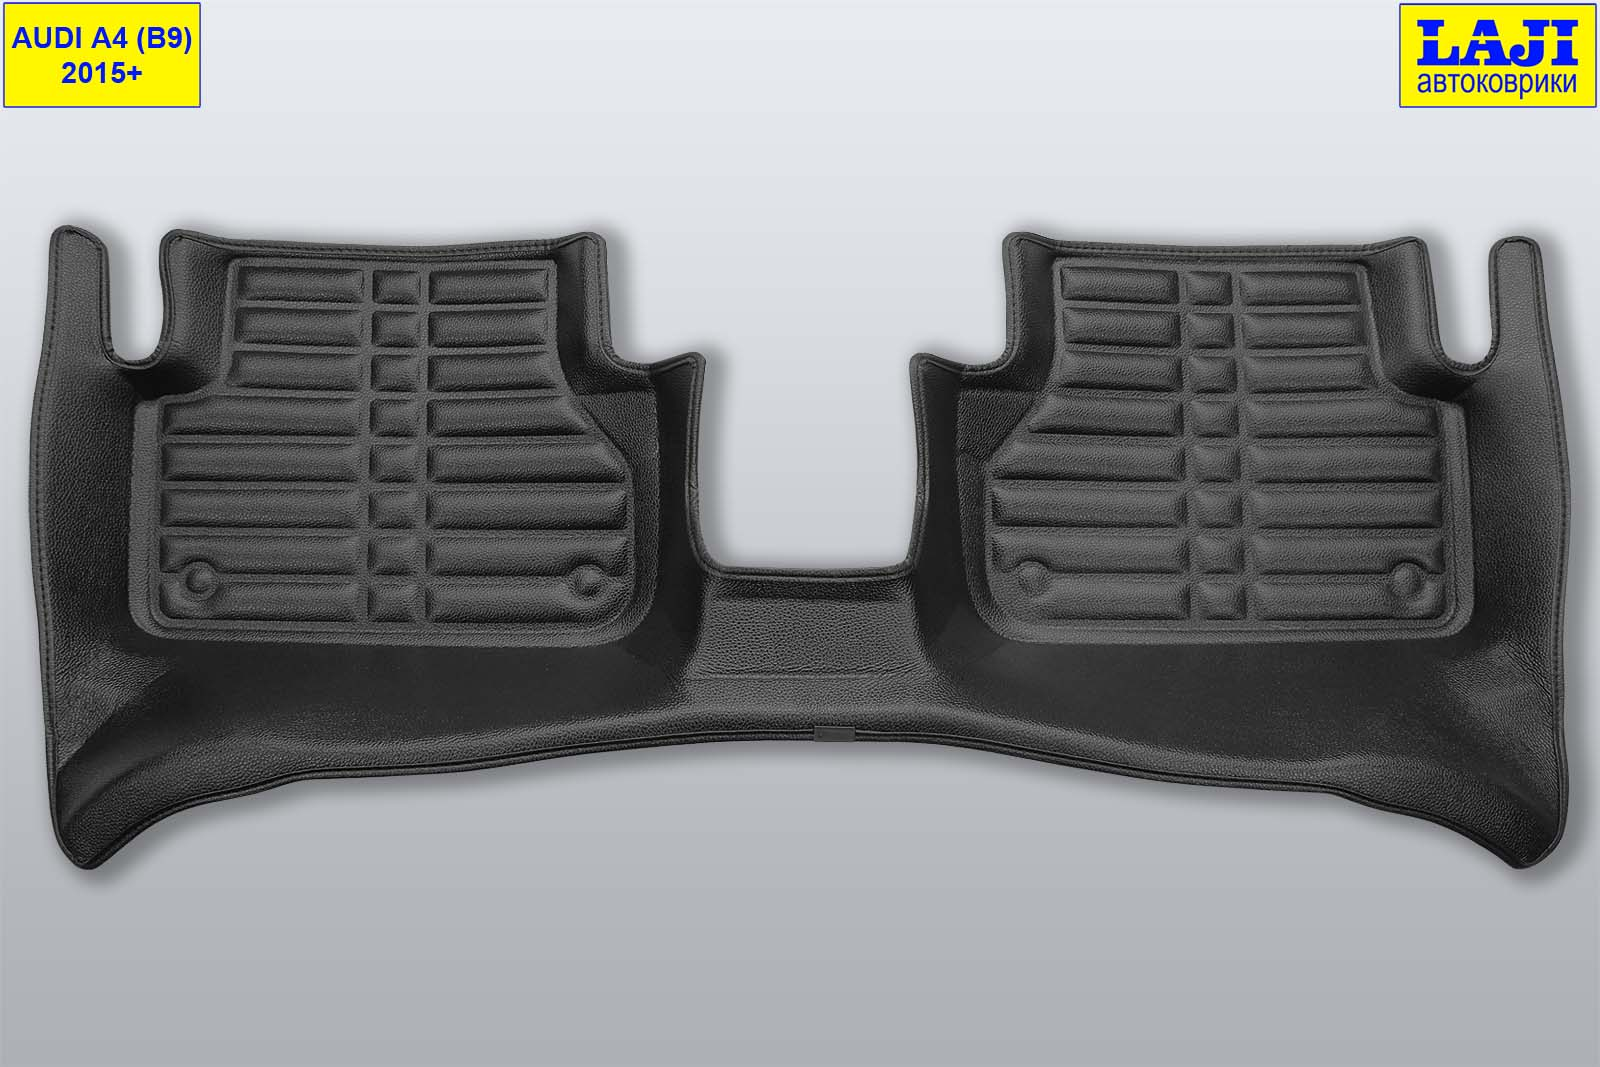 5D коврики для Audi A4 B9 2015-н.в. 10